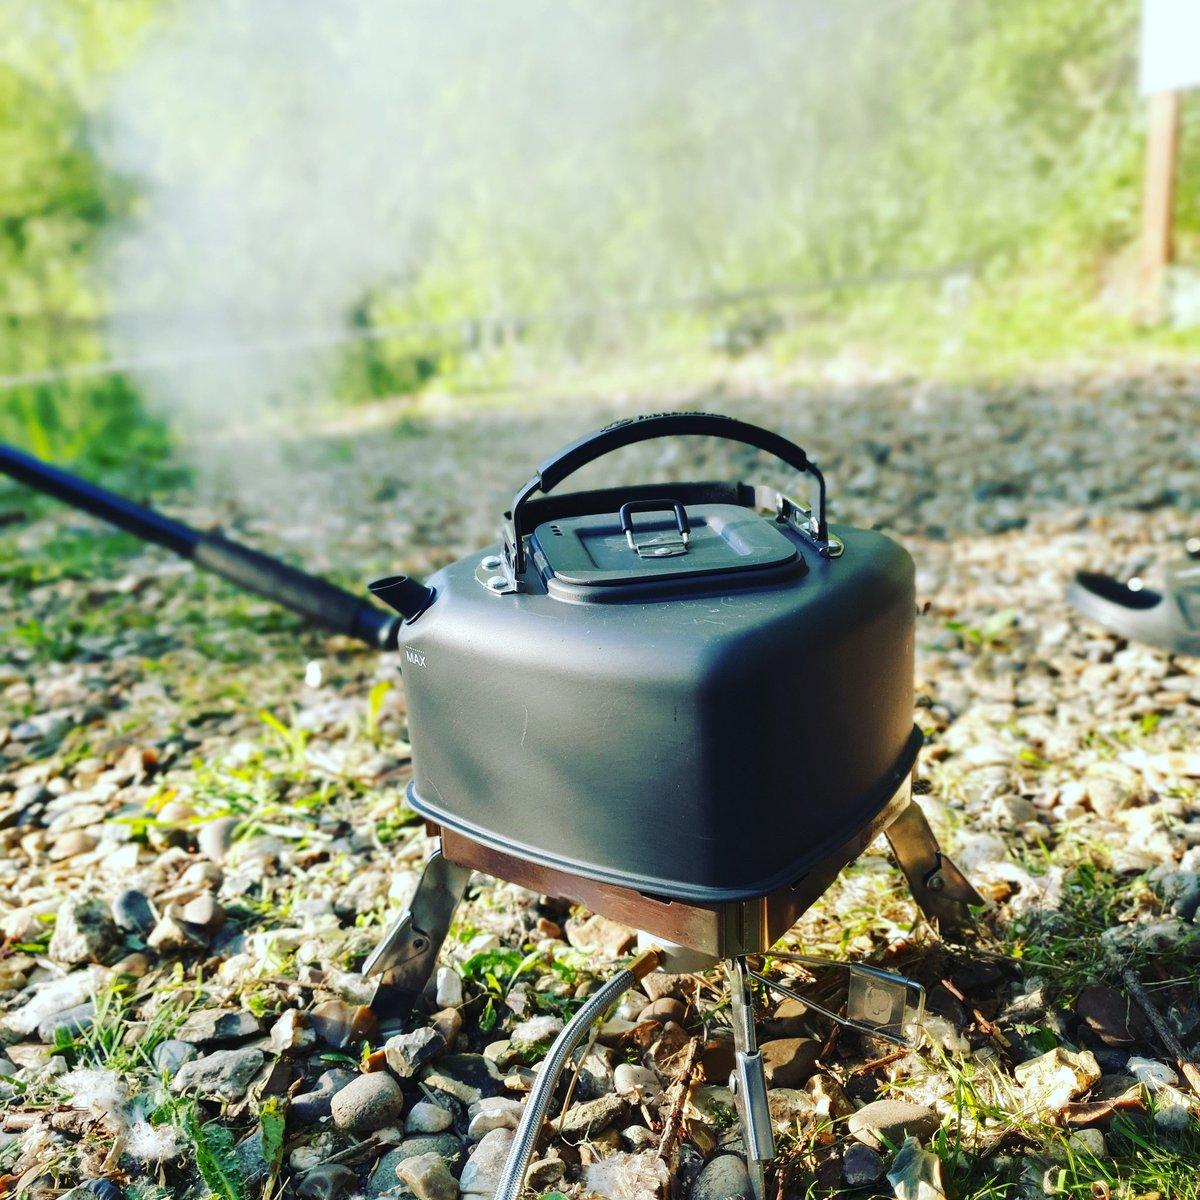 Blanked!! Here's a kettle shot #carpfishing #fishinglife #Blank https://t.co/fDibftEbE7